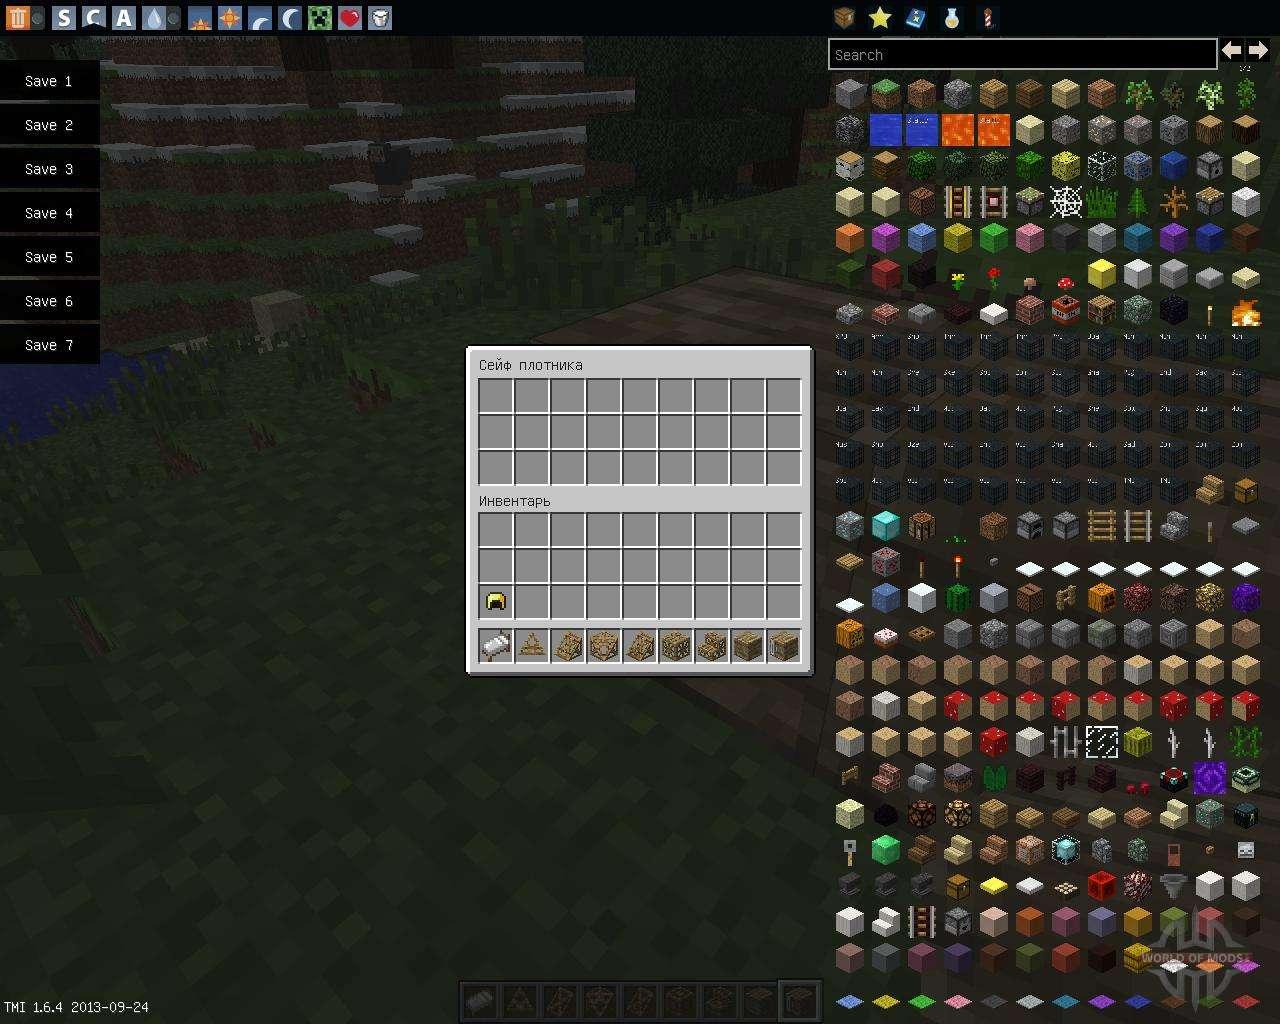 minecraft 1.8.1 tmi